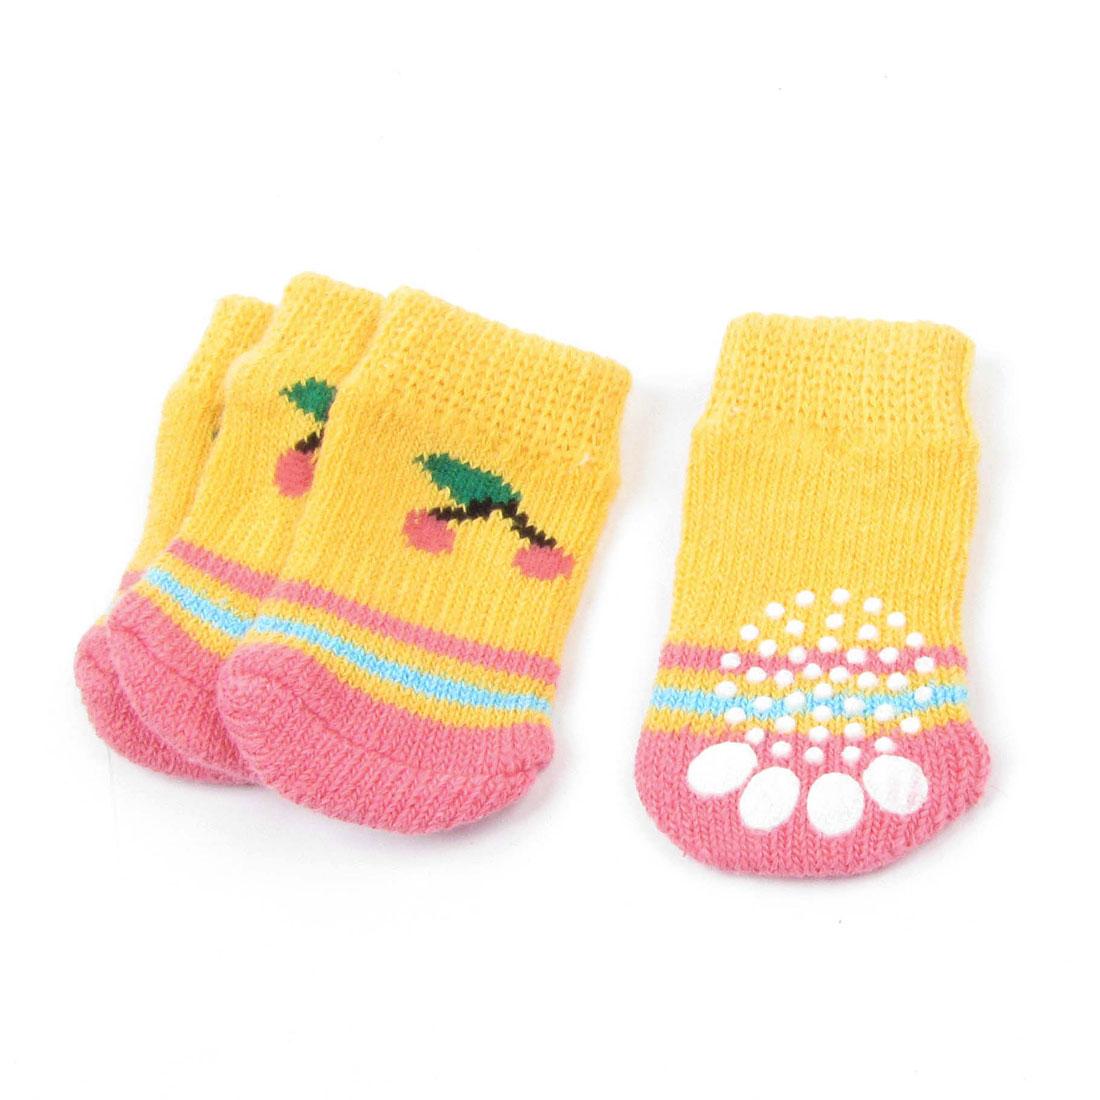 Orange Pink Size S Paw Pattern Nonskid Acrylic Knitted Pet Dog Socks 4 Pcs